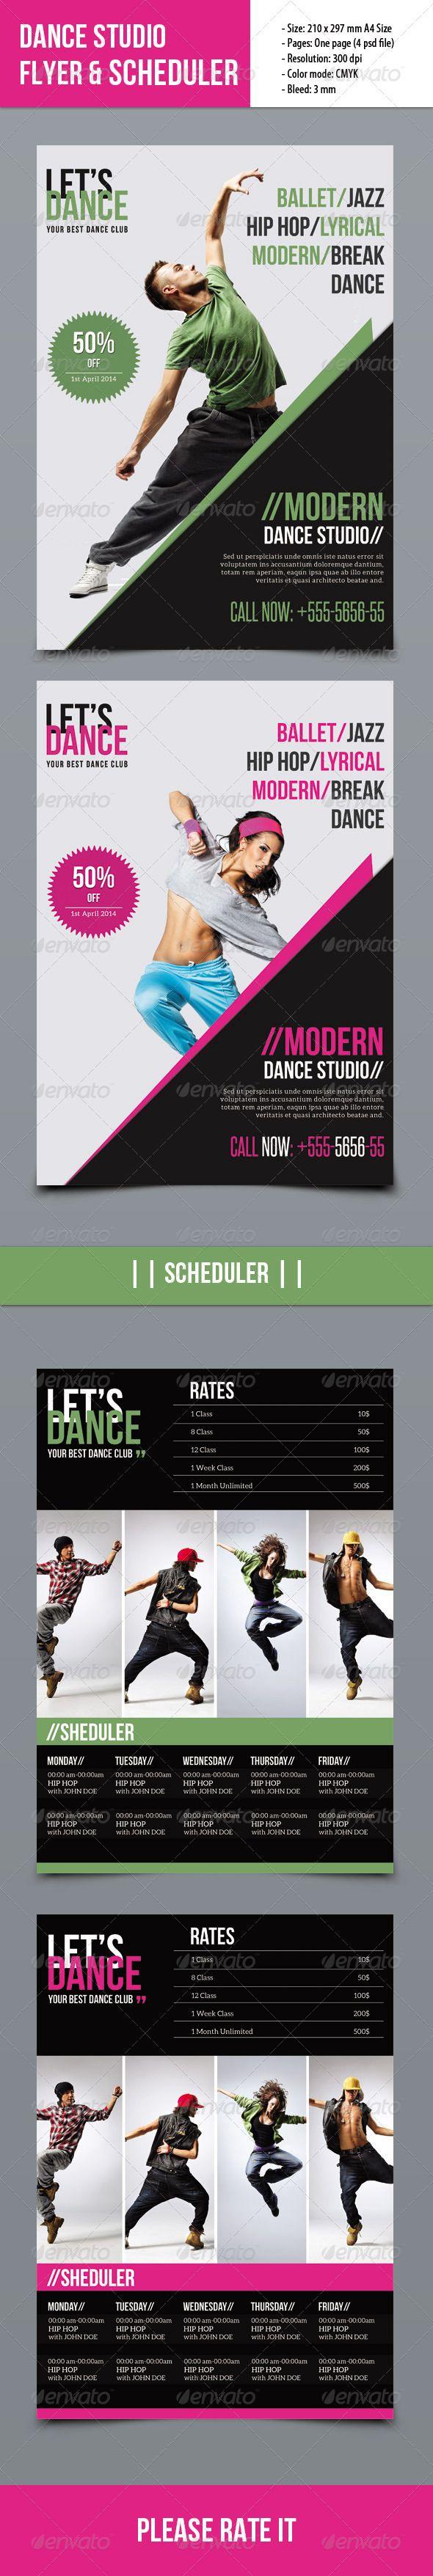 Dance Studio Flyer — Photoshop PSD #corporate #flyer • Available here → https://graphicriver.net/item/dance-studio-flyer/7596852?ref=pxcr